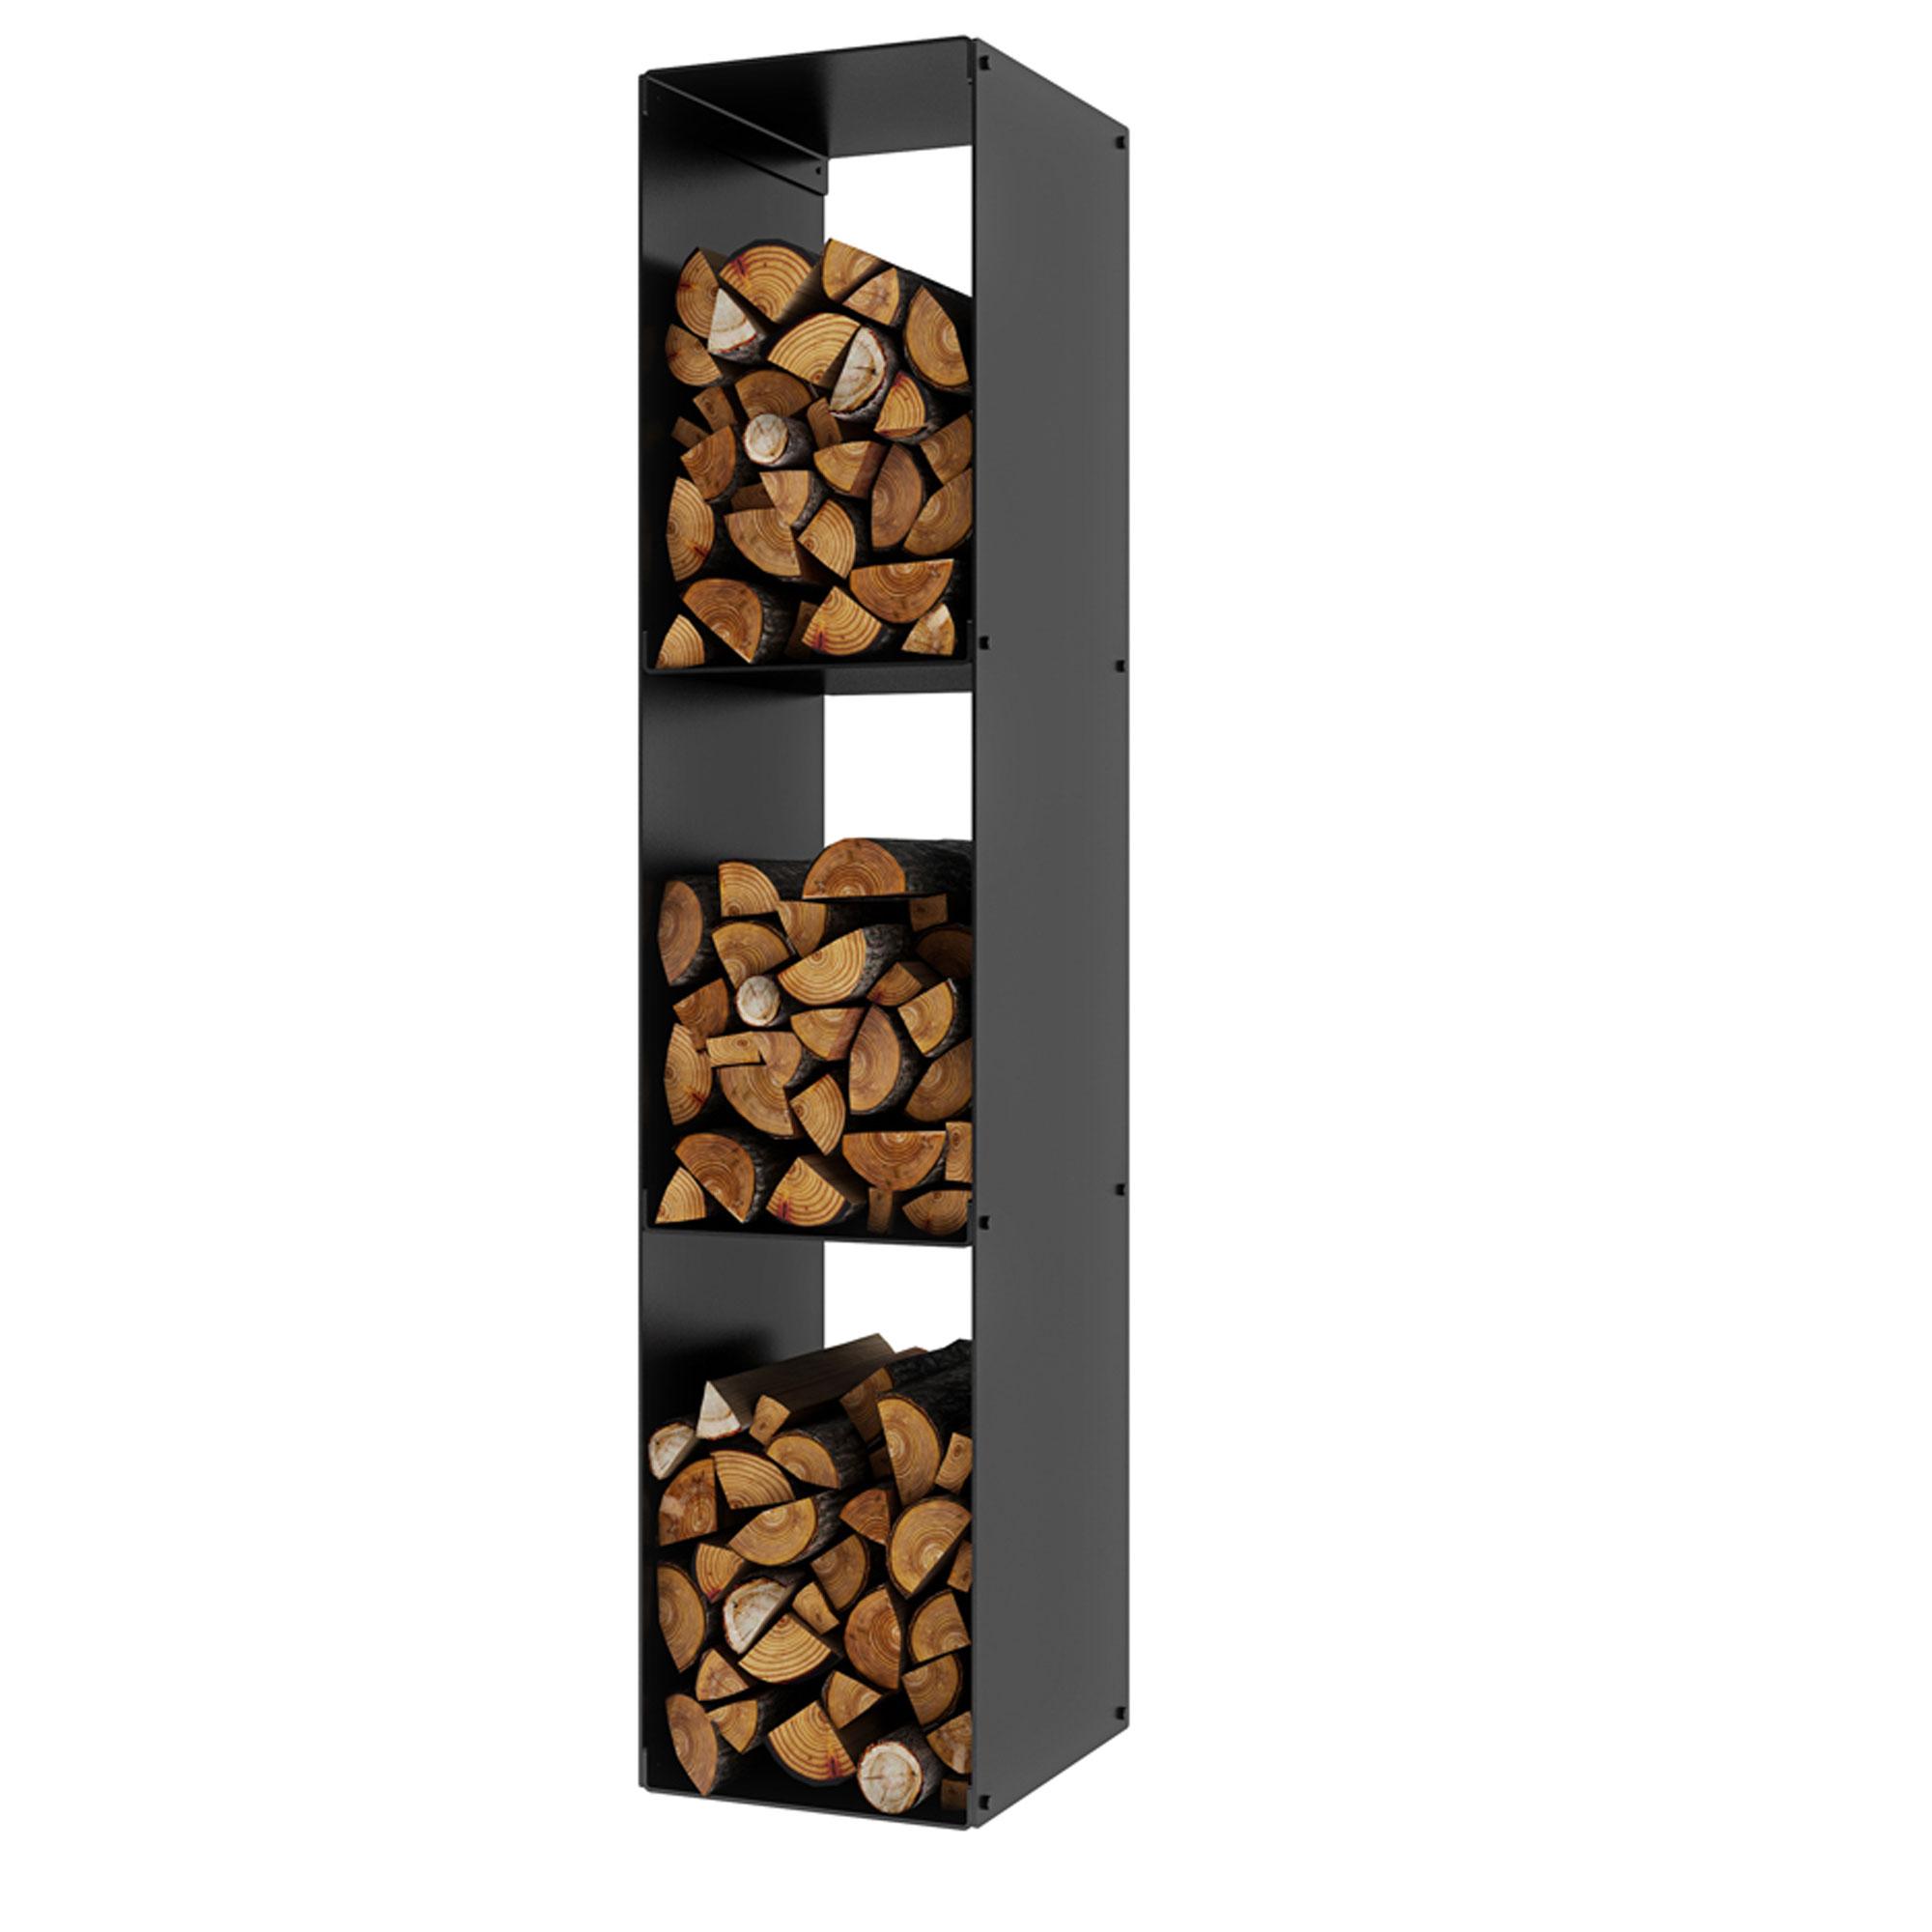 An image of Rais Firewood Rack Three Compartments - Black